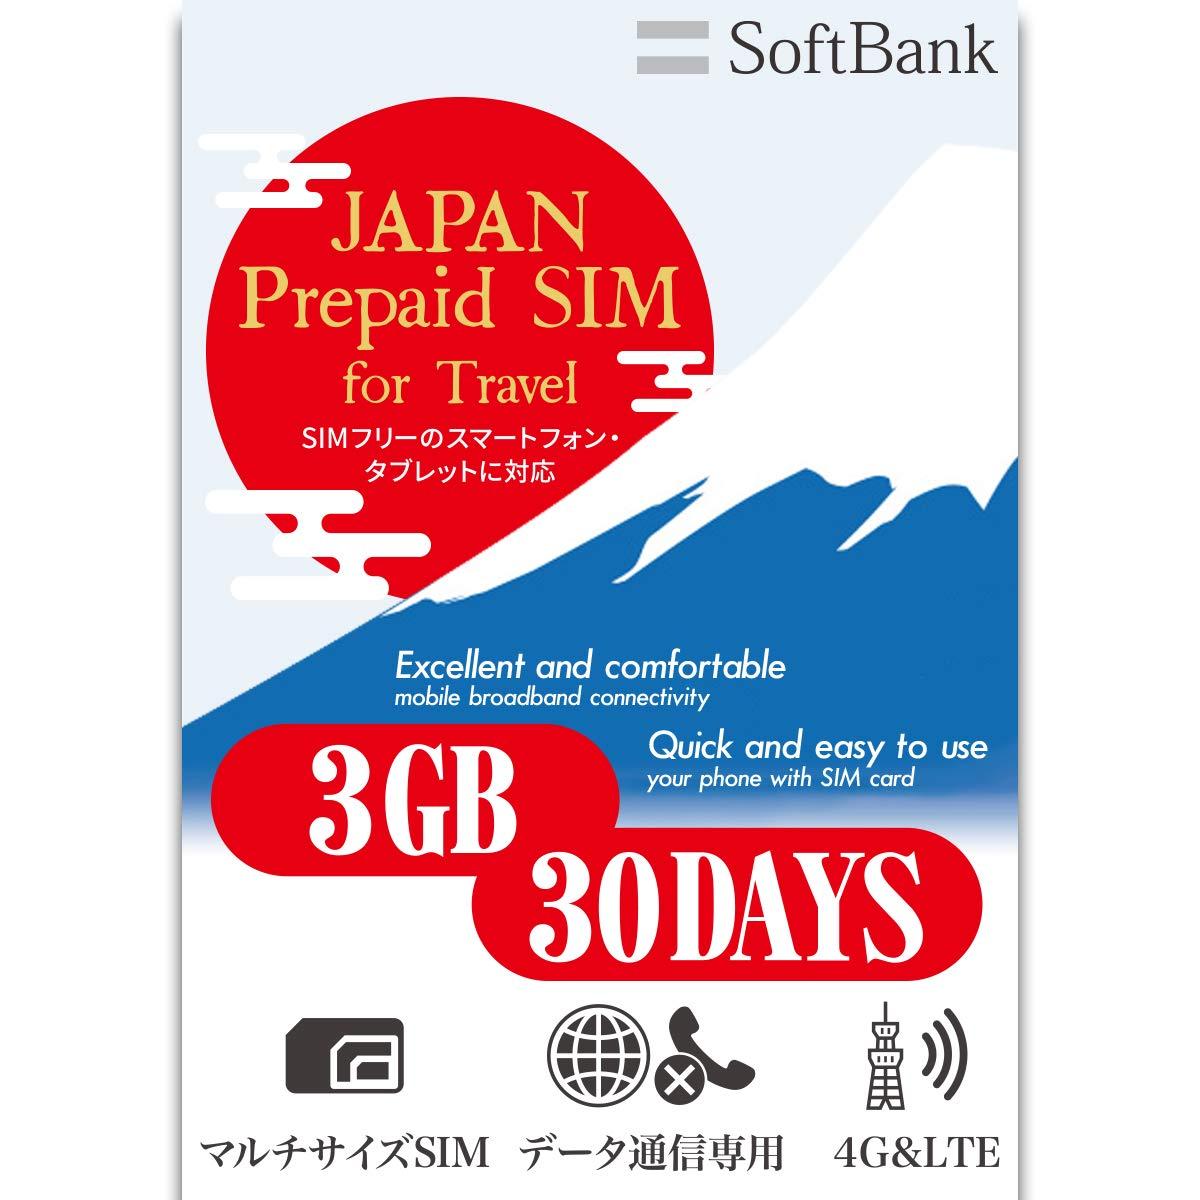 【P5倍 8/26 23:59まで】 プリペイドsim 日本 softbank プリペイドsimカード simカード プリペイド sim card 3GB 30日 マルチカットsim MicroSIM NanoSIM ソフトバンク 携帯 携帯電話